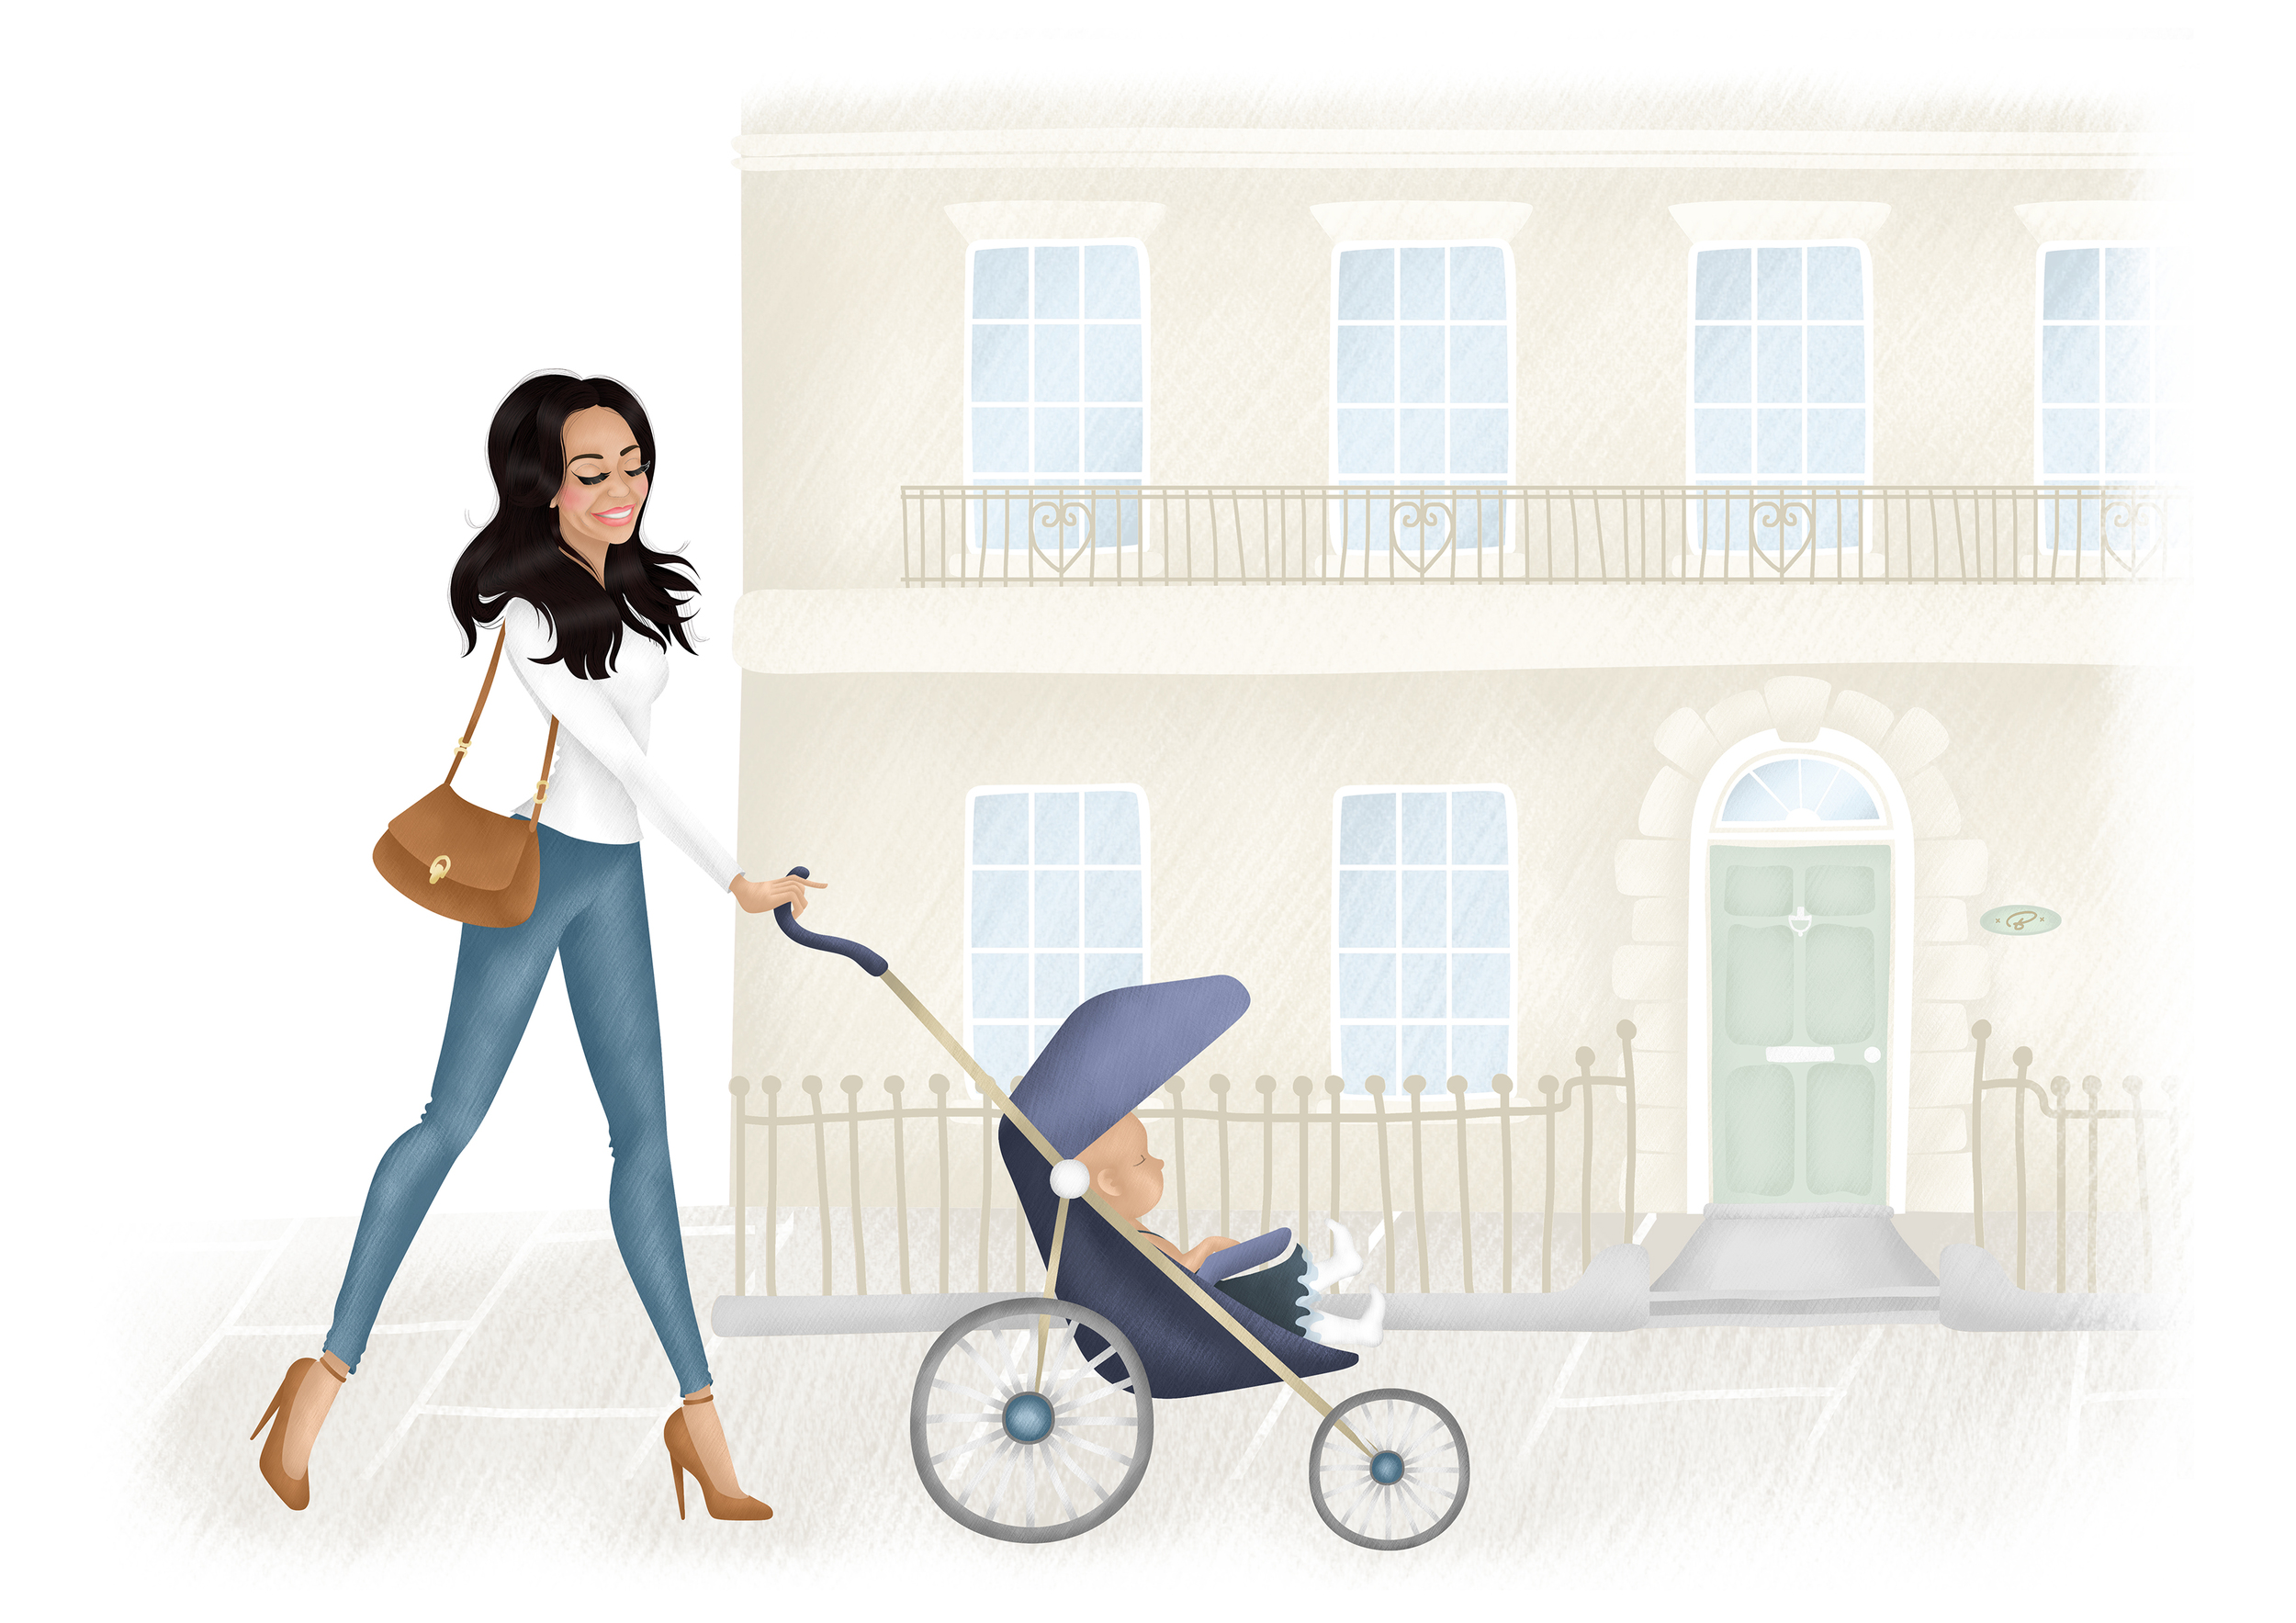 The Baby Aim - Website Landing Page Header illustration